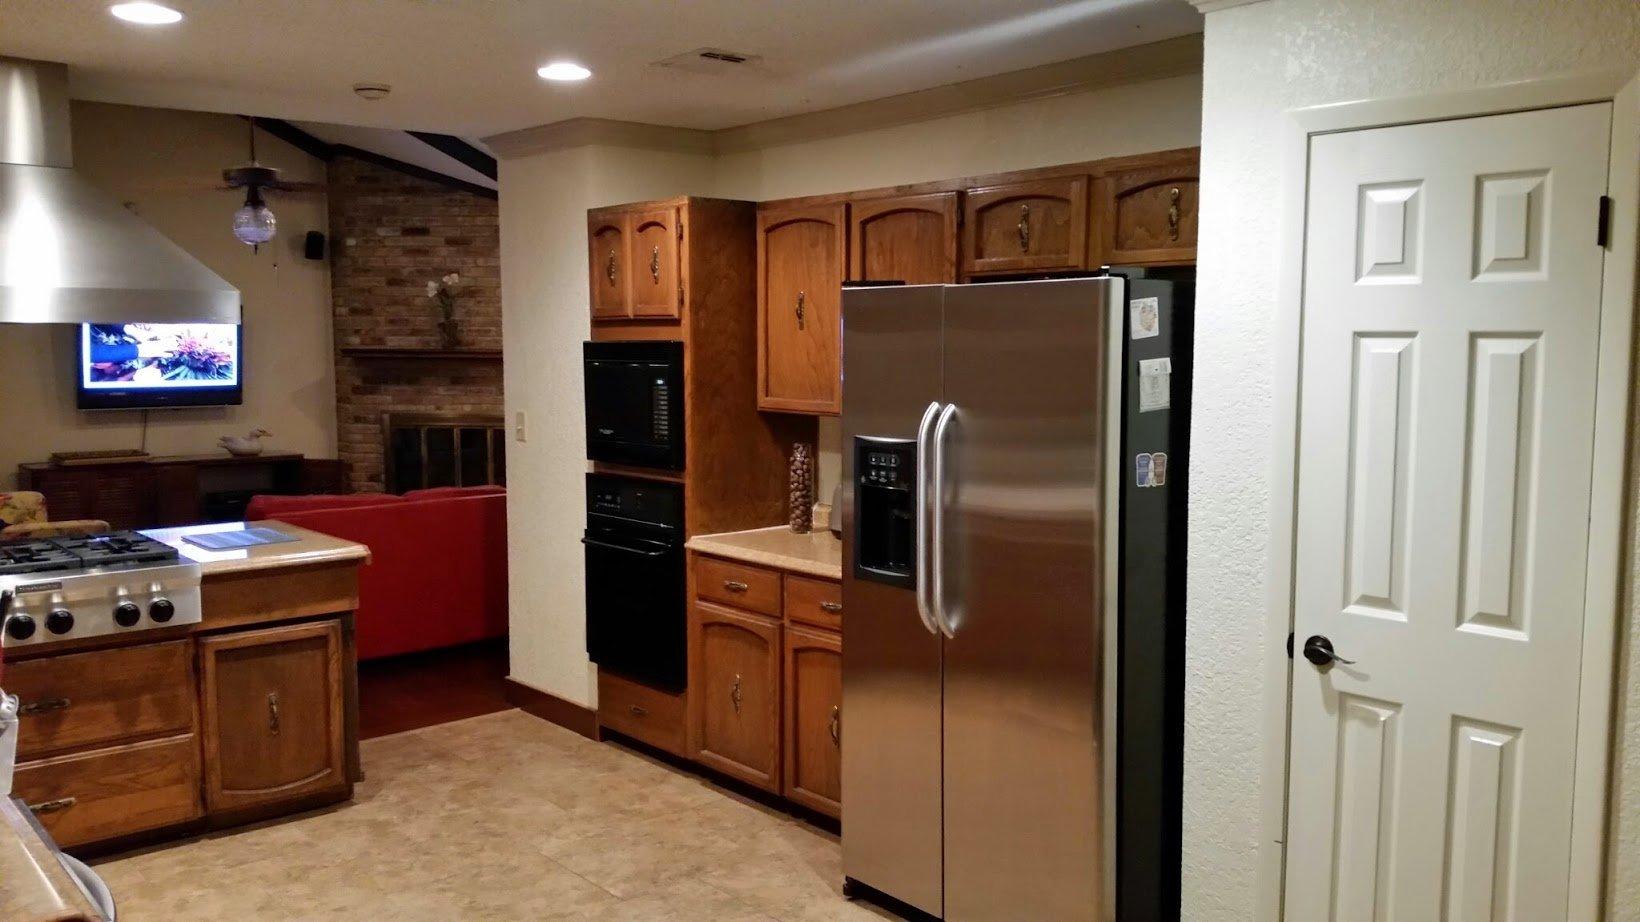 Used Kitchen Cabinets San Antonio Tx Used Kitchen Cabinets Ta Rooms Kitchen Cabinets In San